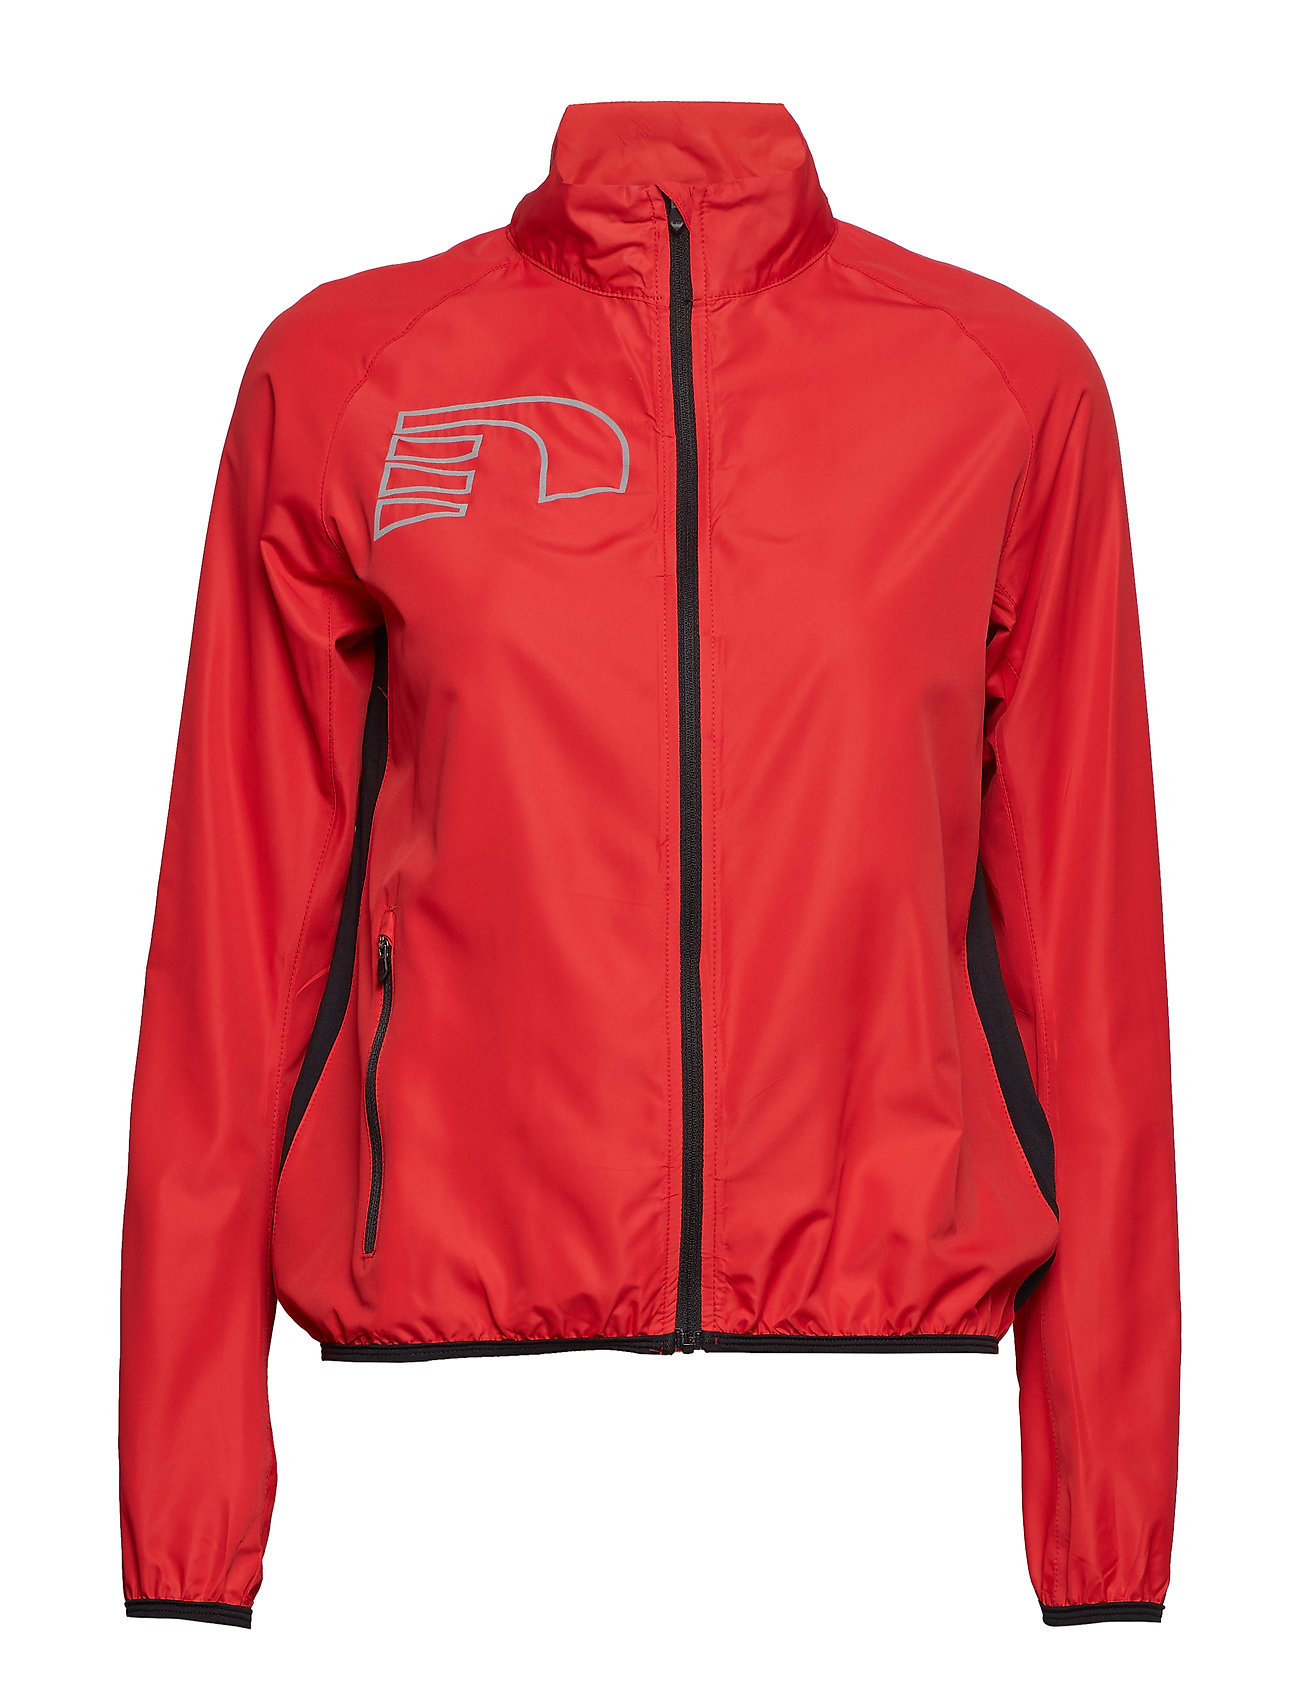 Newline Core Jacket